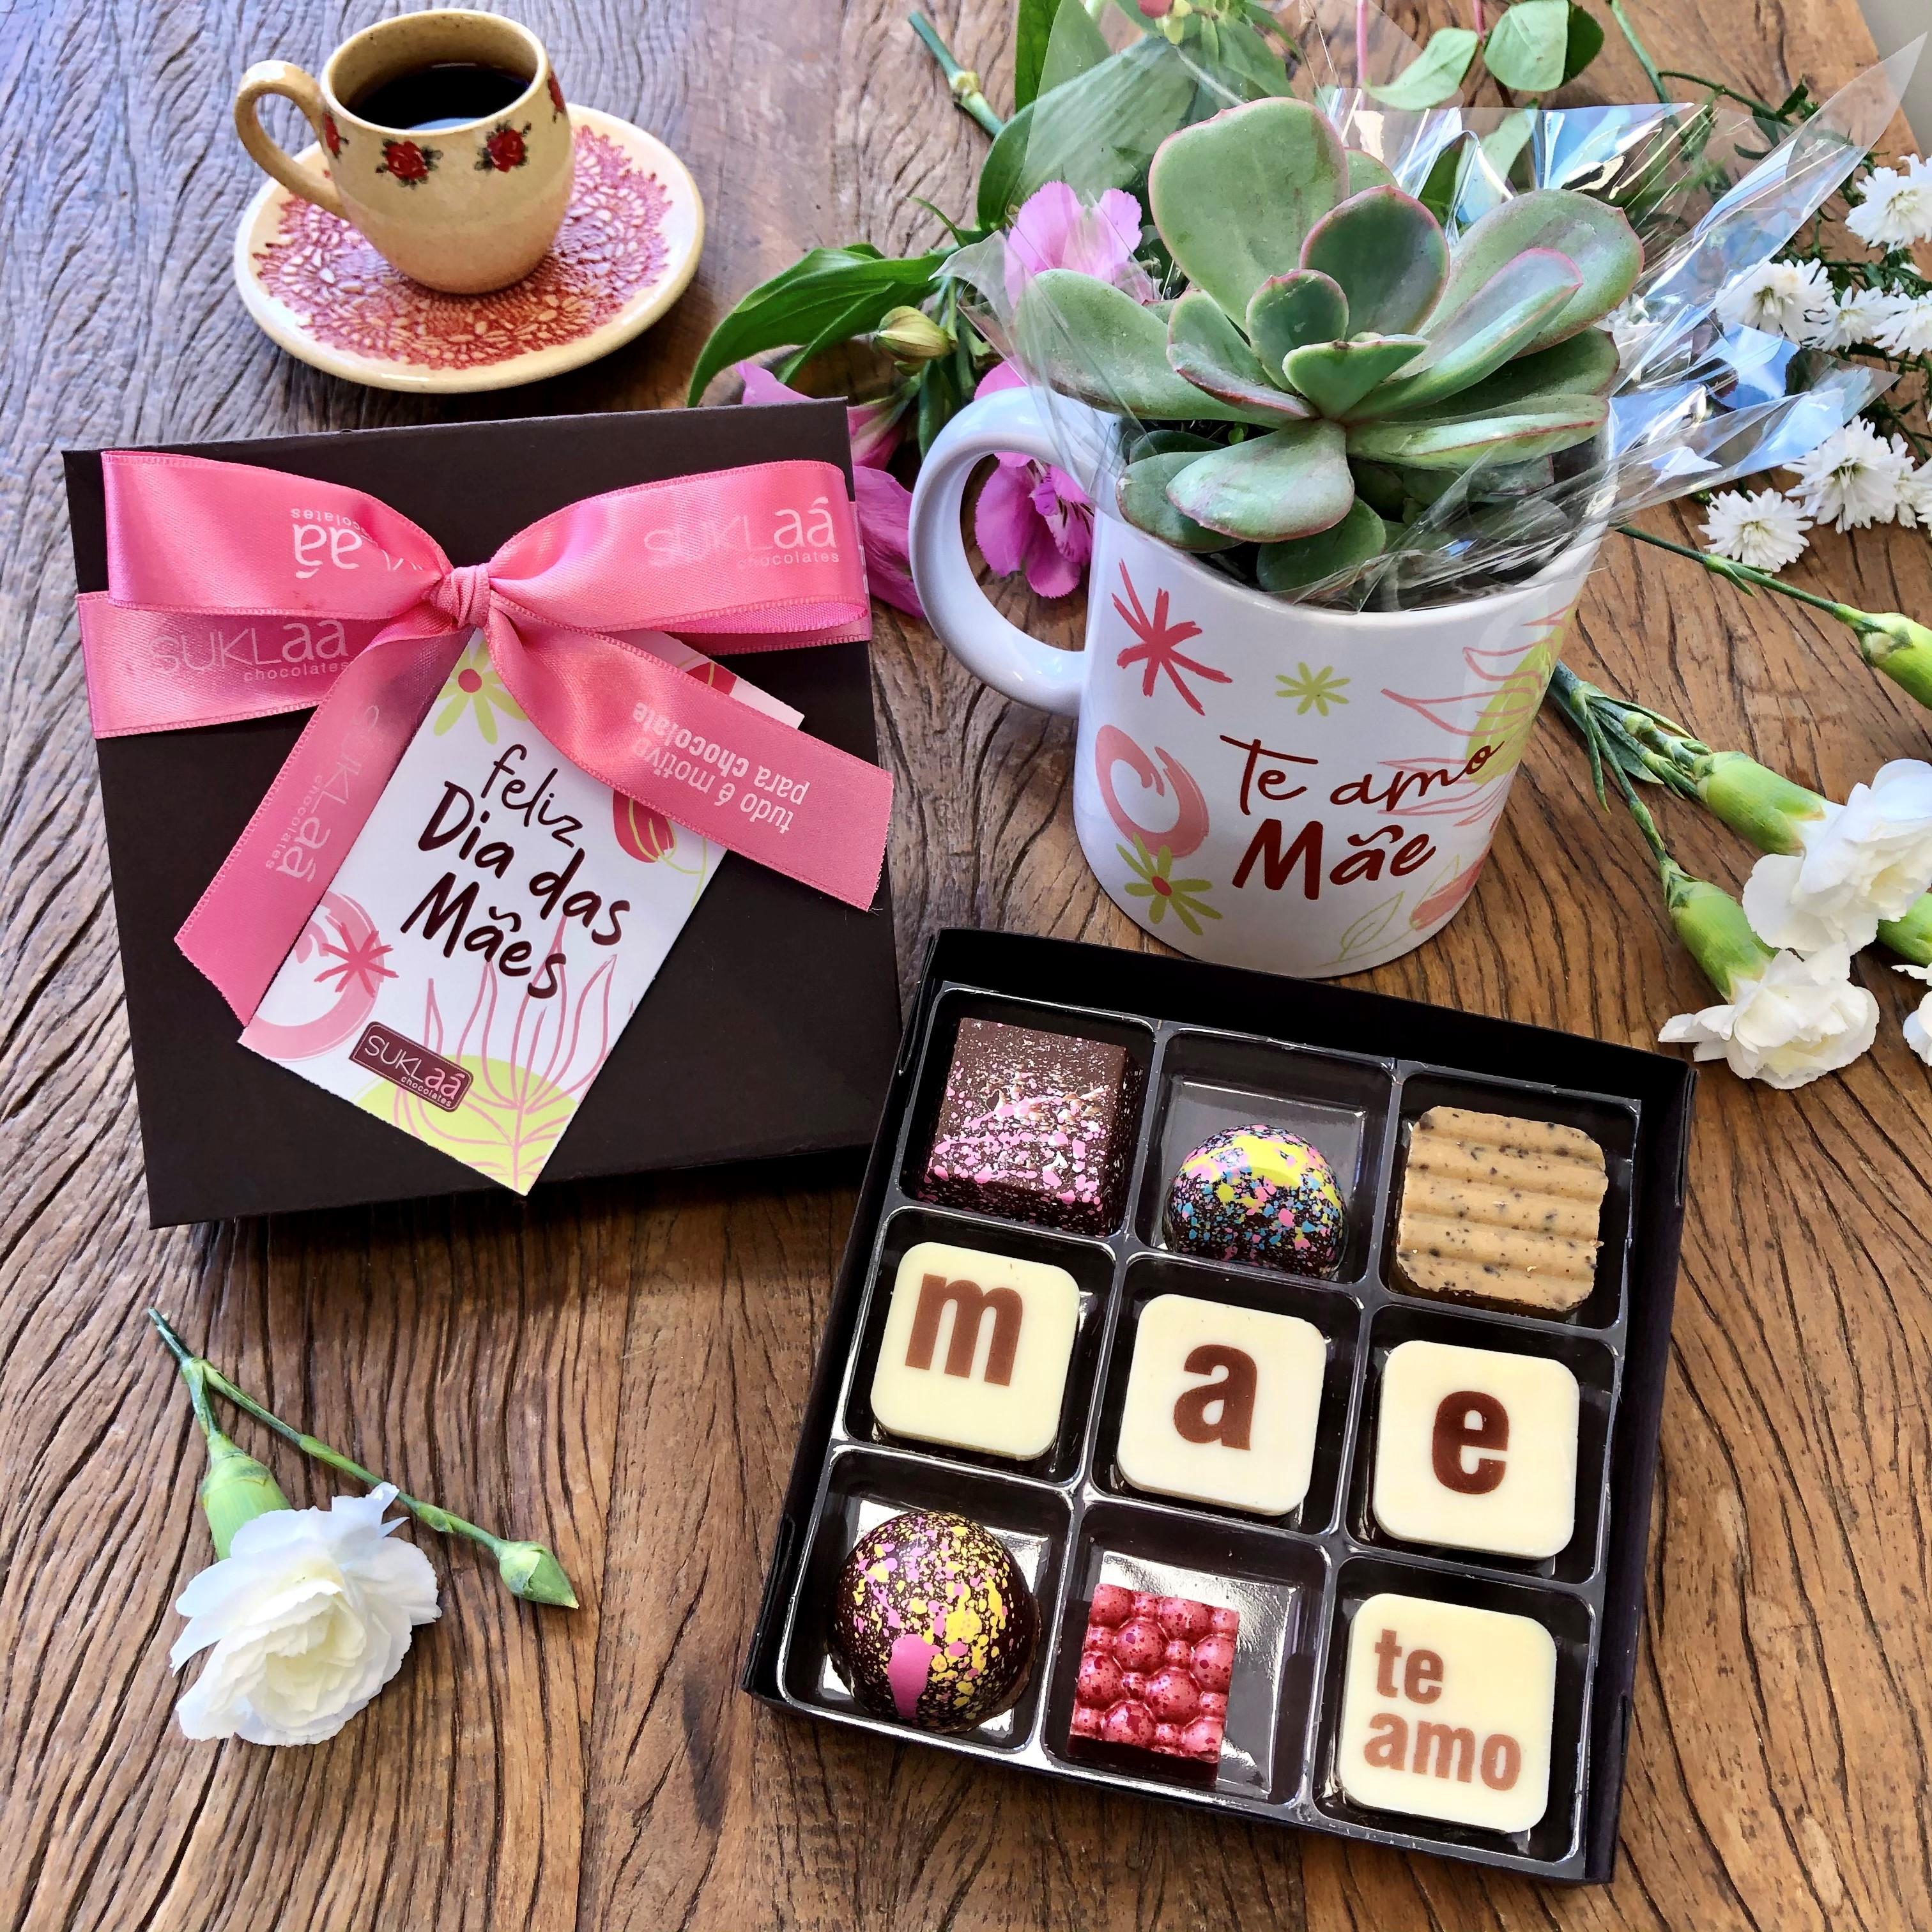 Chocolab 9 bombons - Dia das Mães